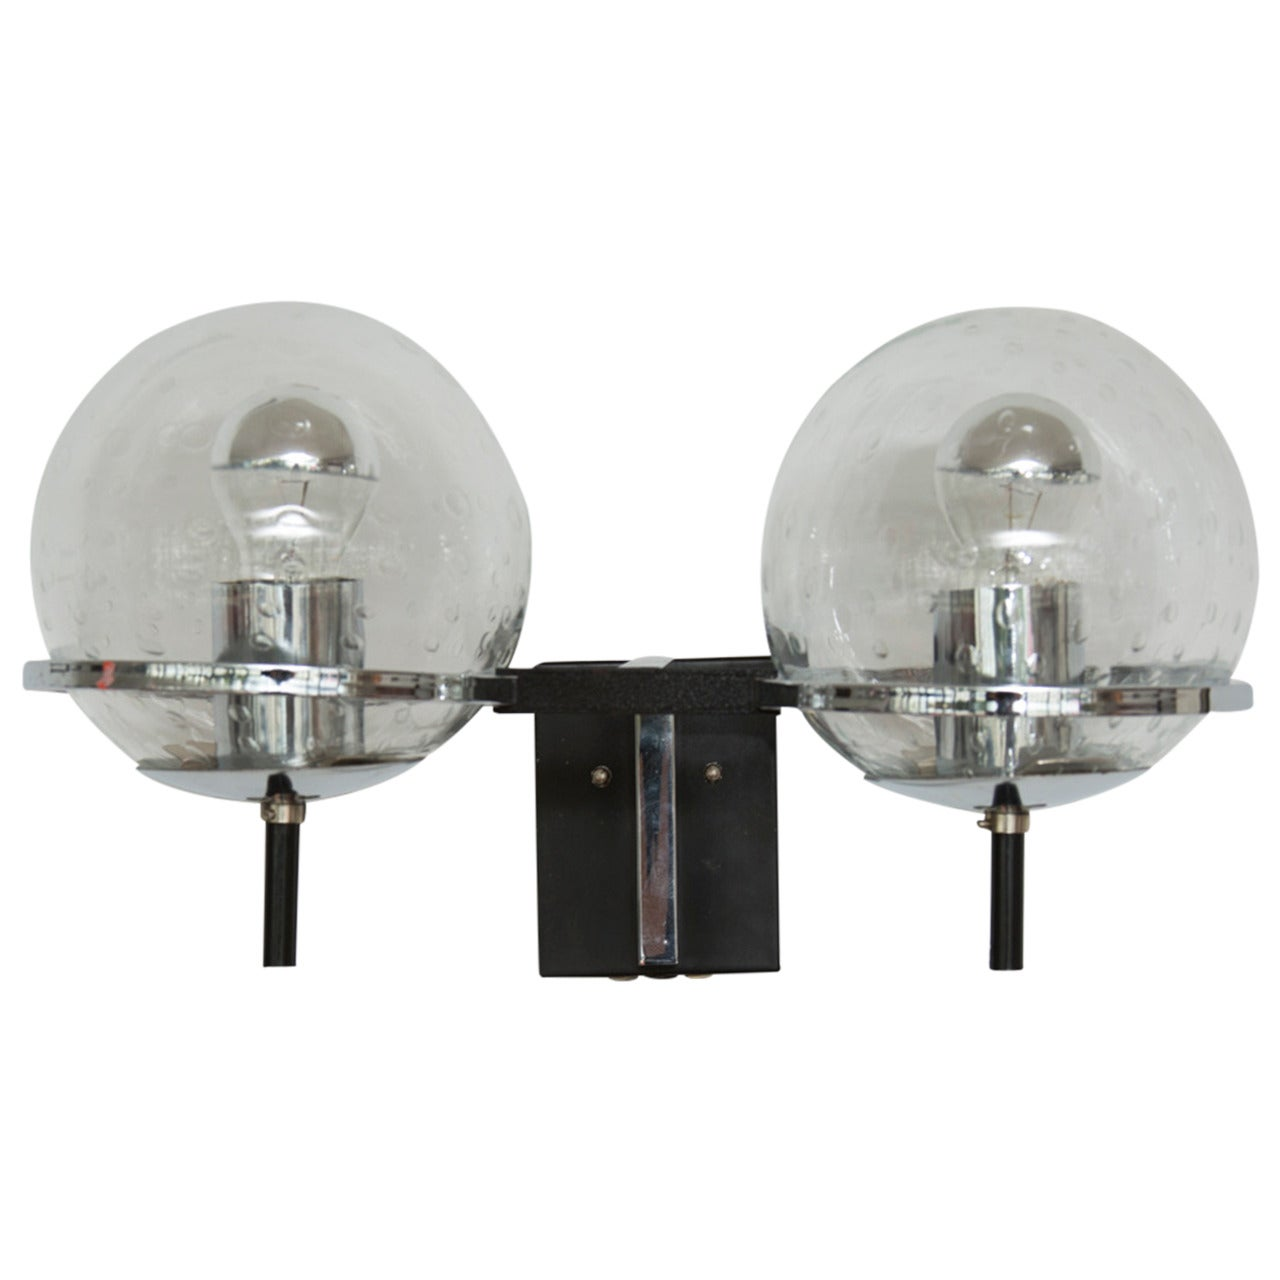 Pair of RAAK Double Globe Wall Lights